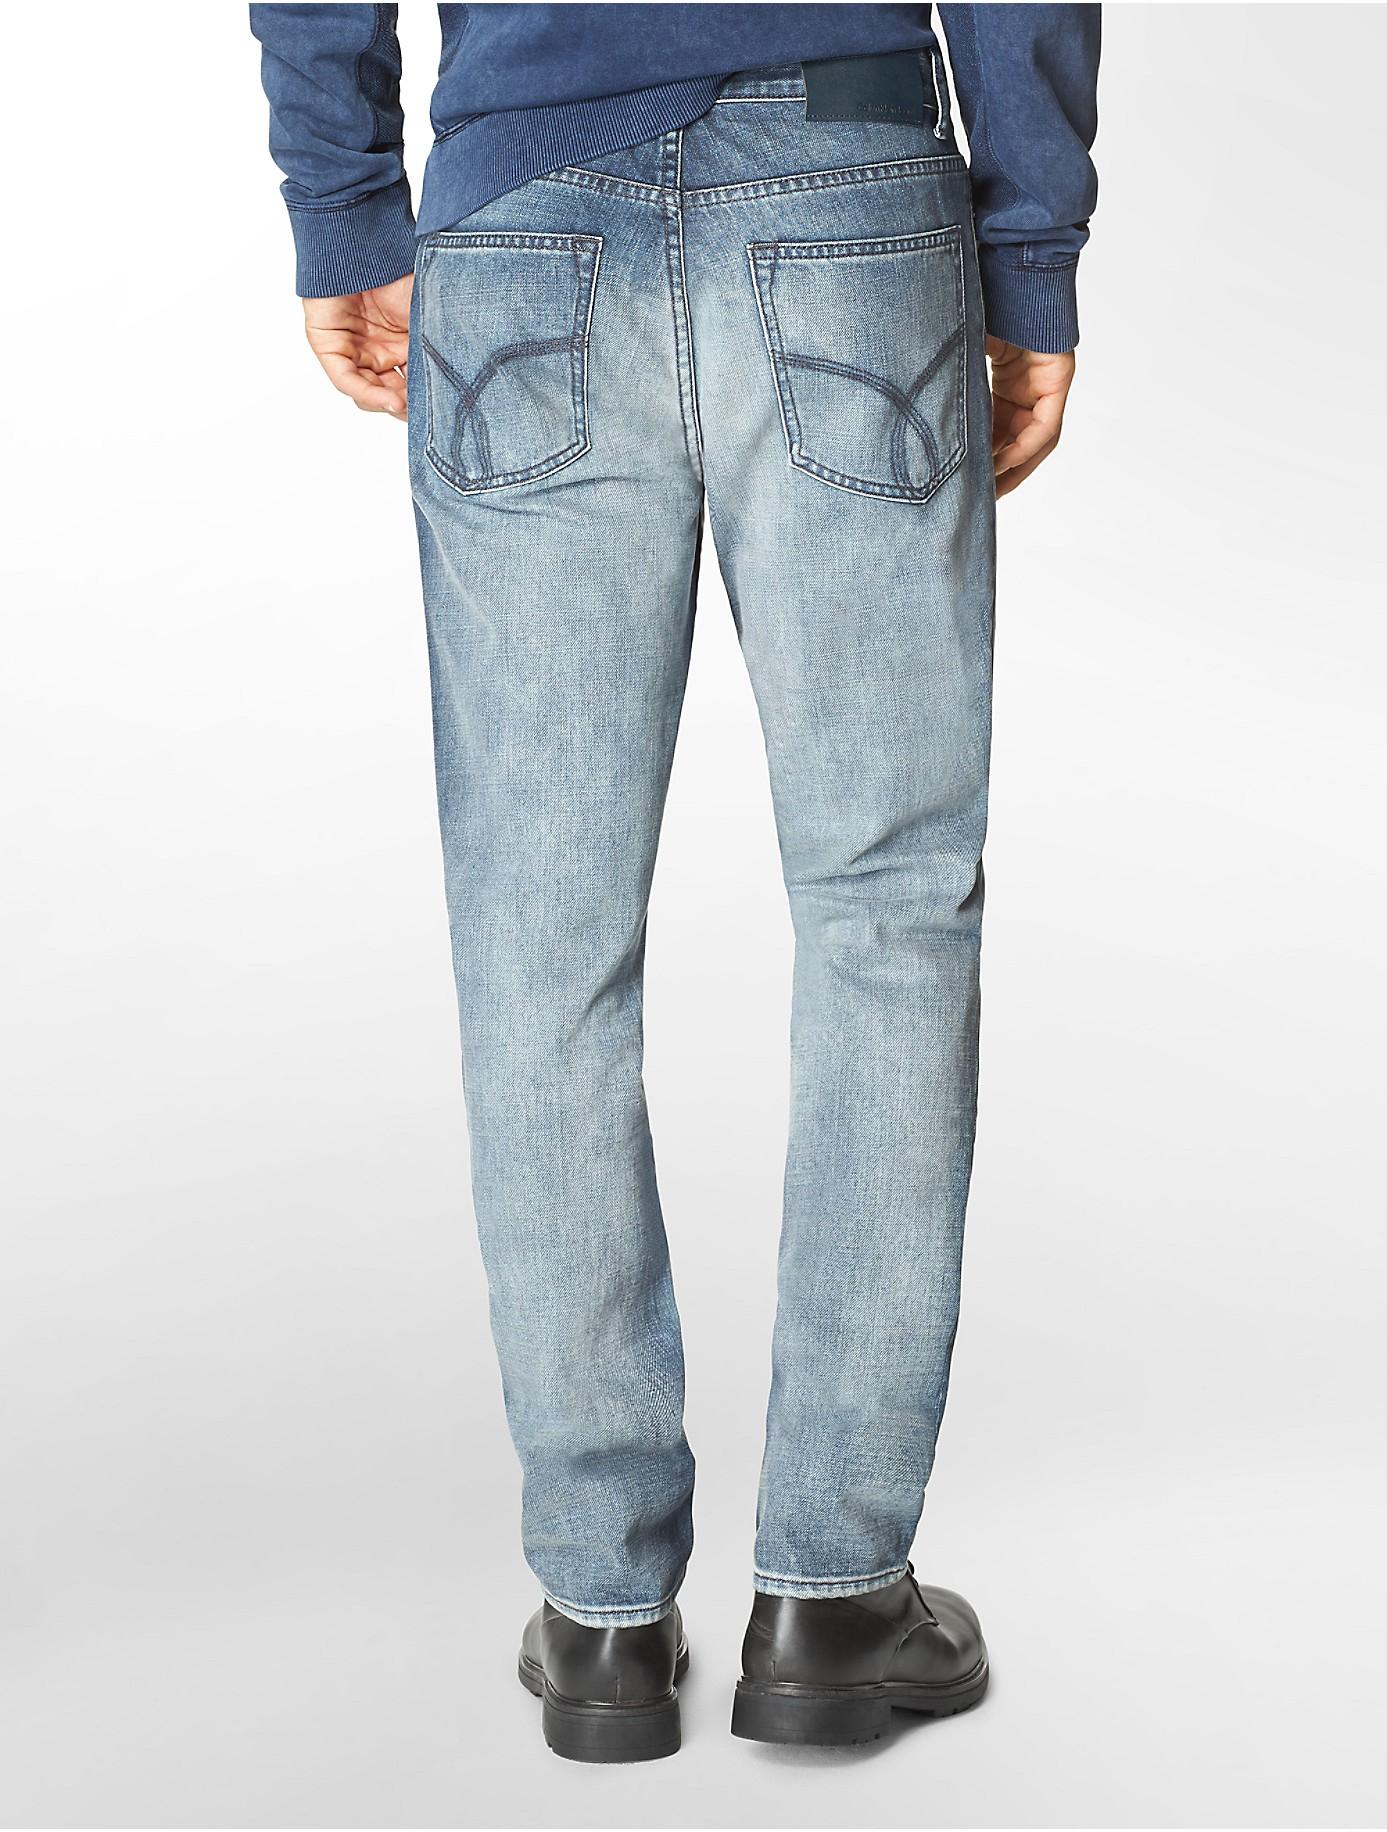 calvin klein jeans slim straight leg chalked indigo wash. Black Bedroom Furniture Sets. Home Design Ideas